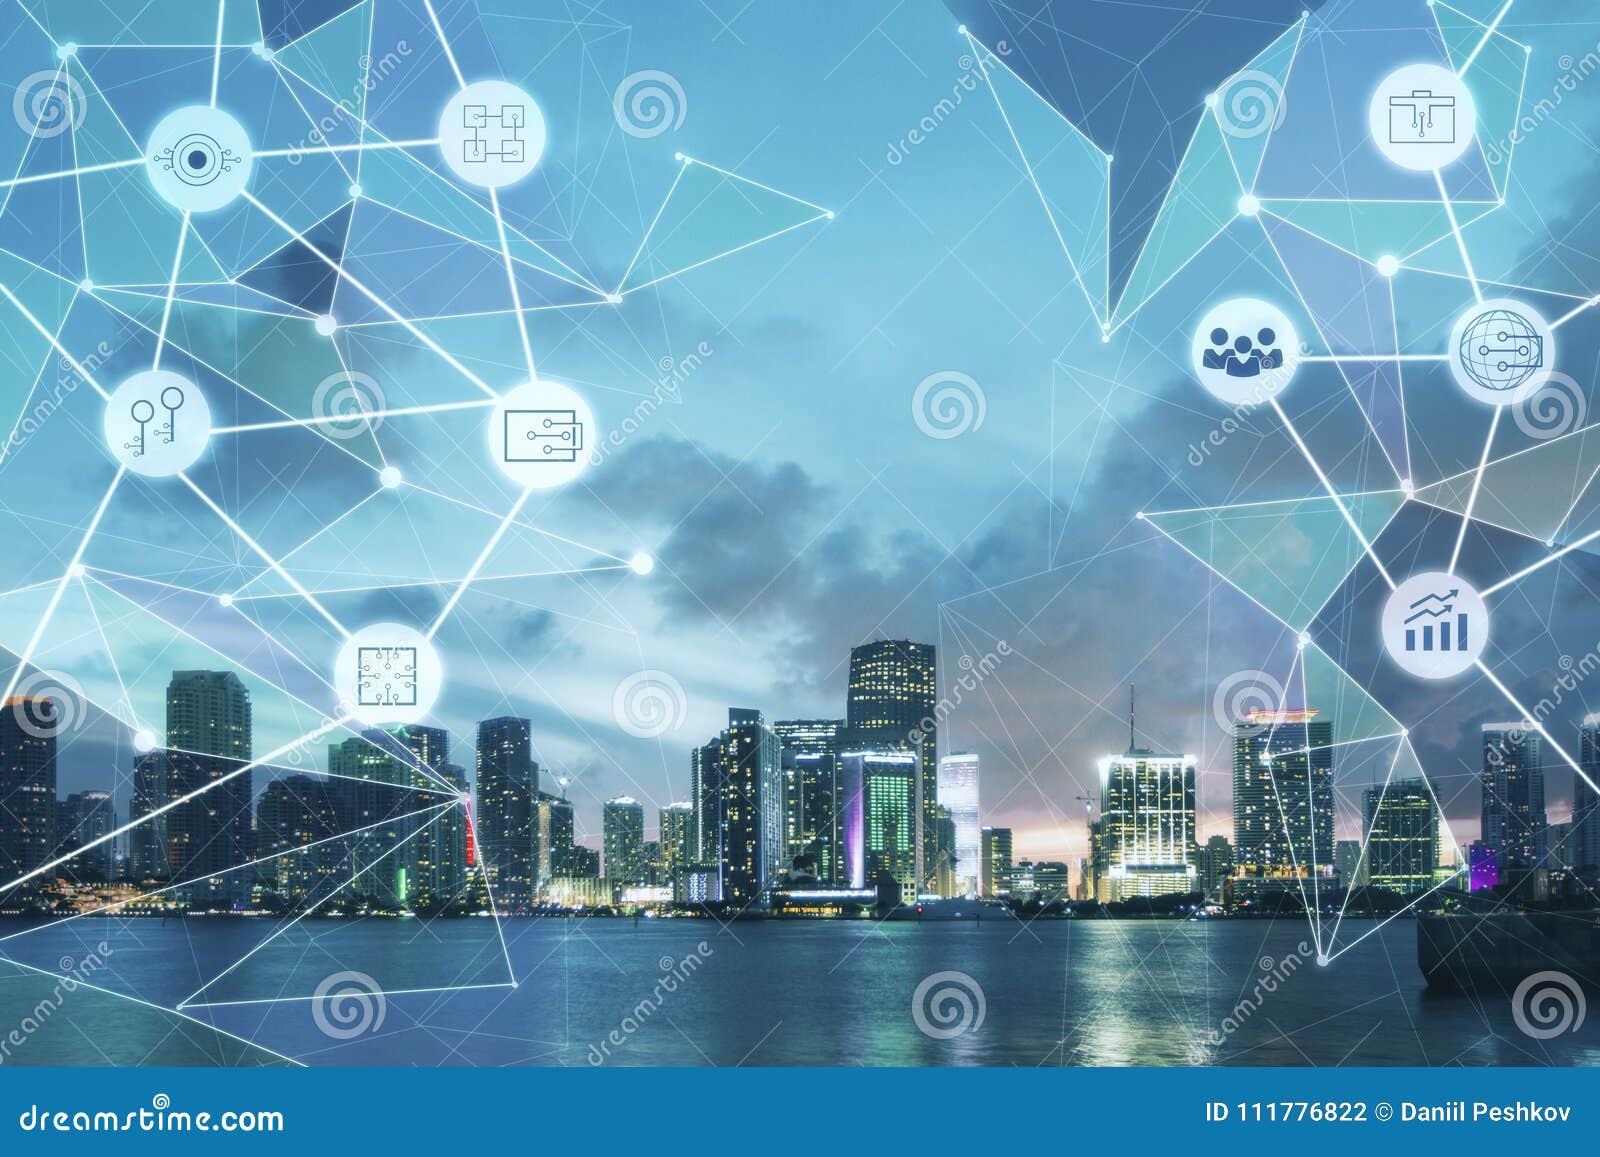 Creative tech city background